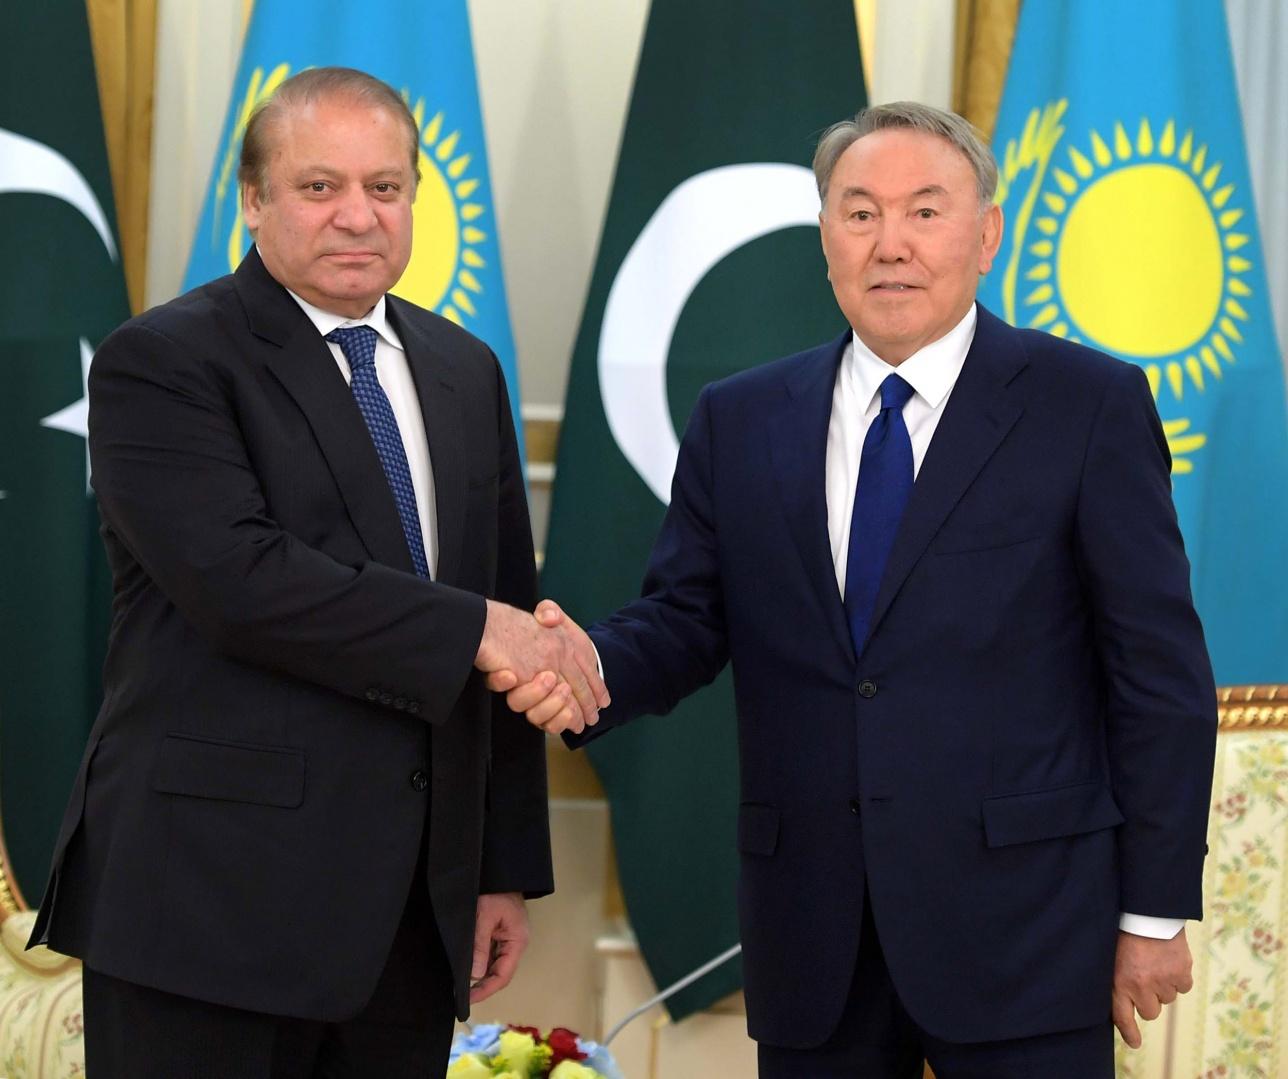 Встреча президента Казахстана и премьер-министра Пакистана